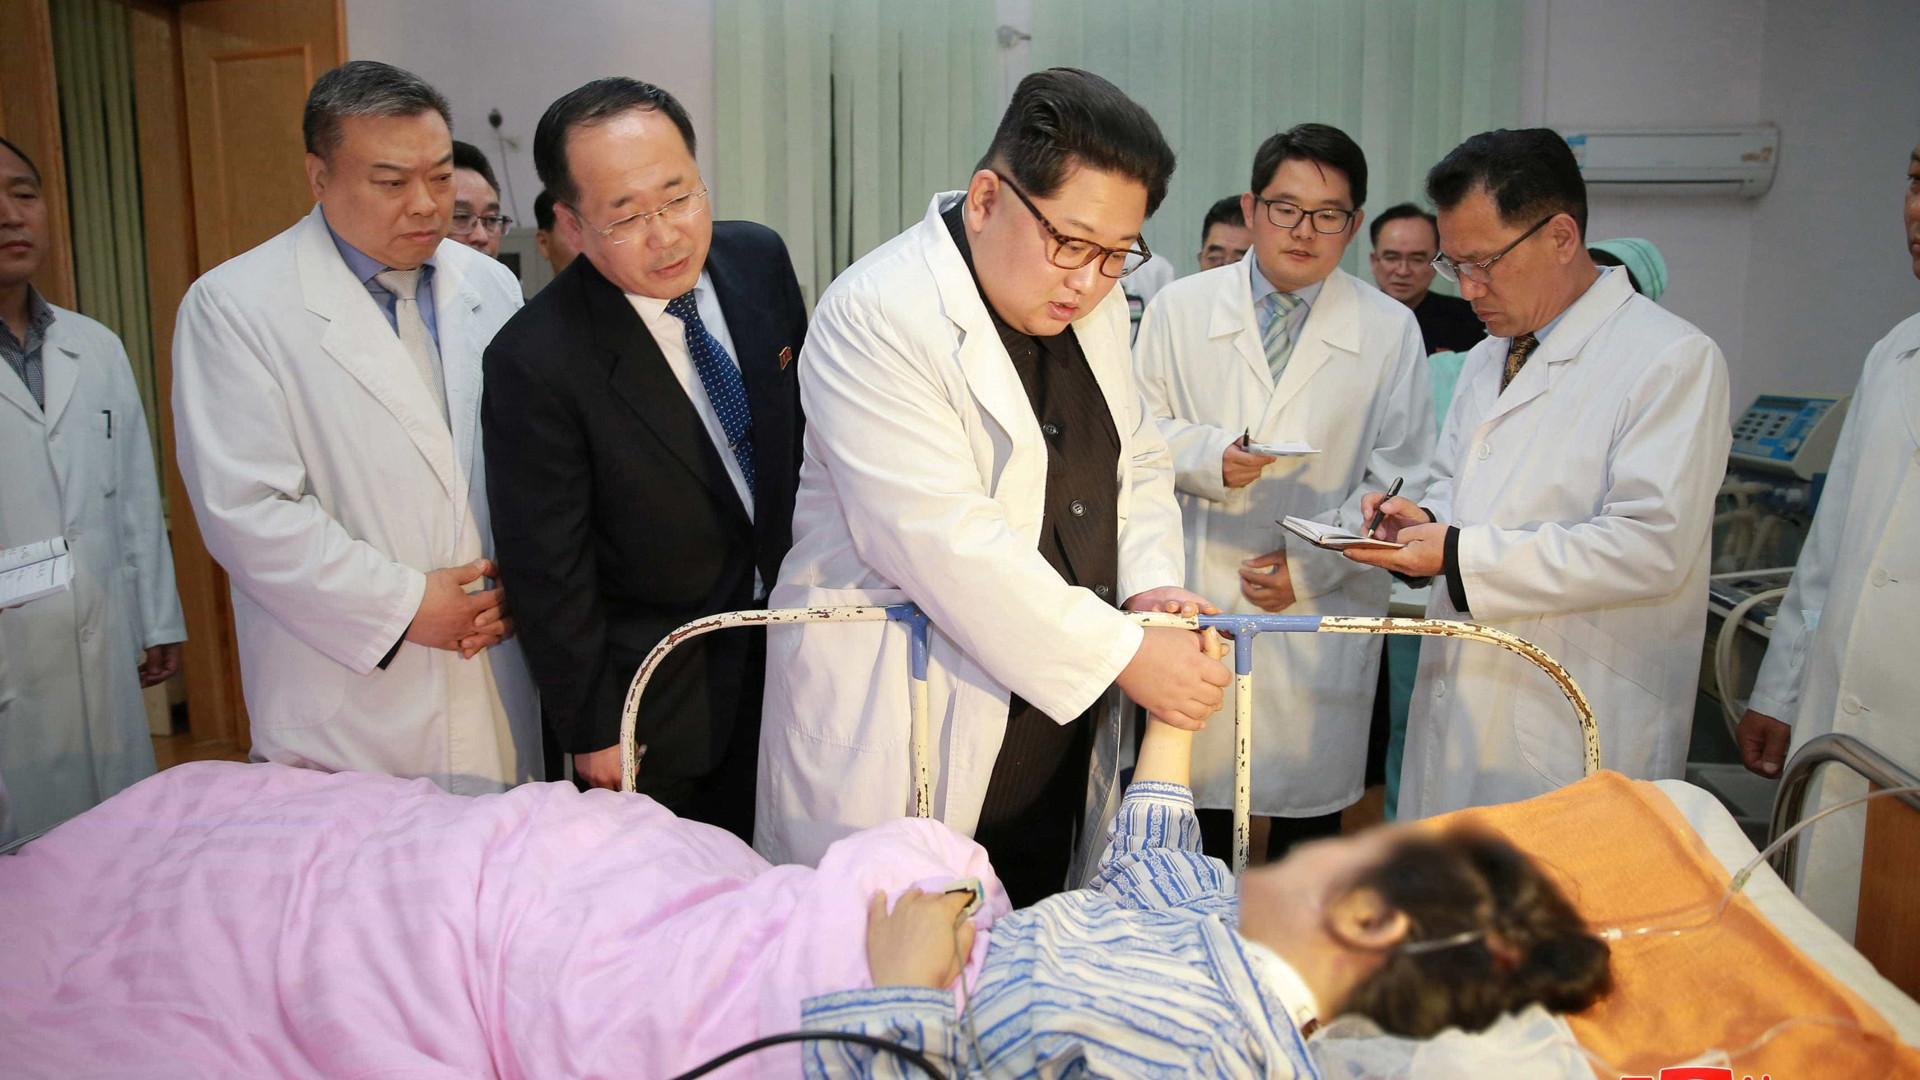 Kim Jong-un visita hospital chinês após acidente que matou 32 turistas